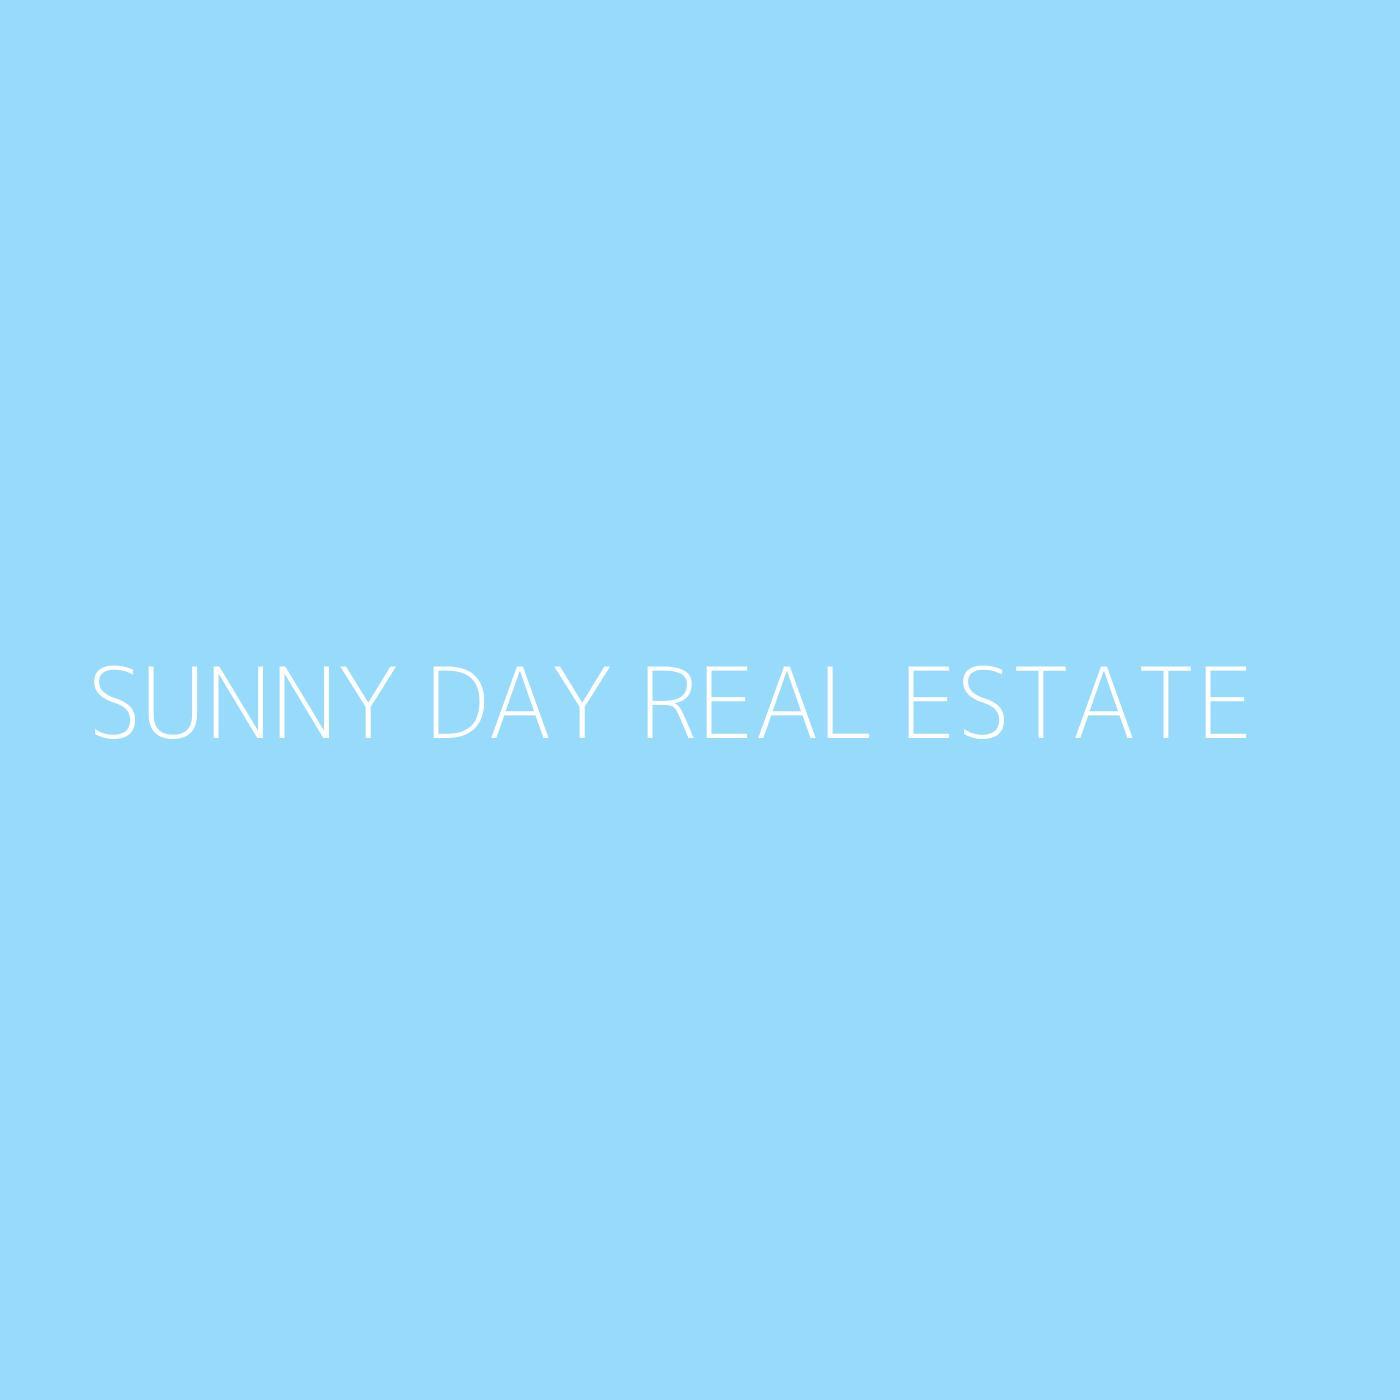 Sunny Day Real Estate Playlist Artwork